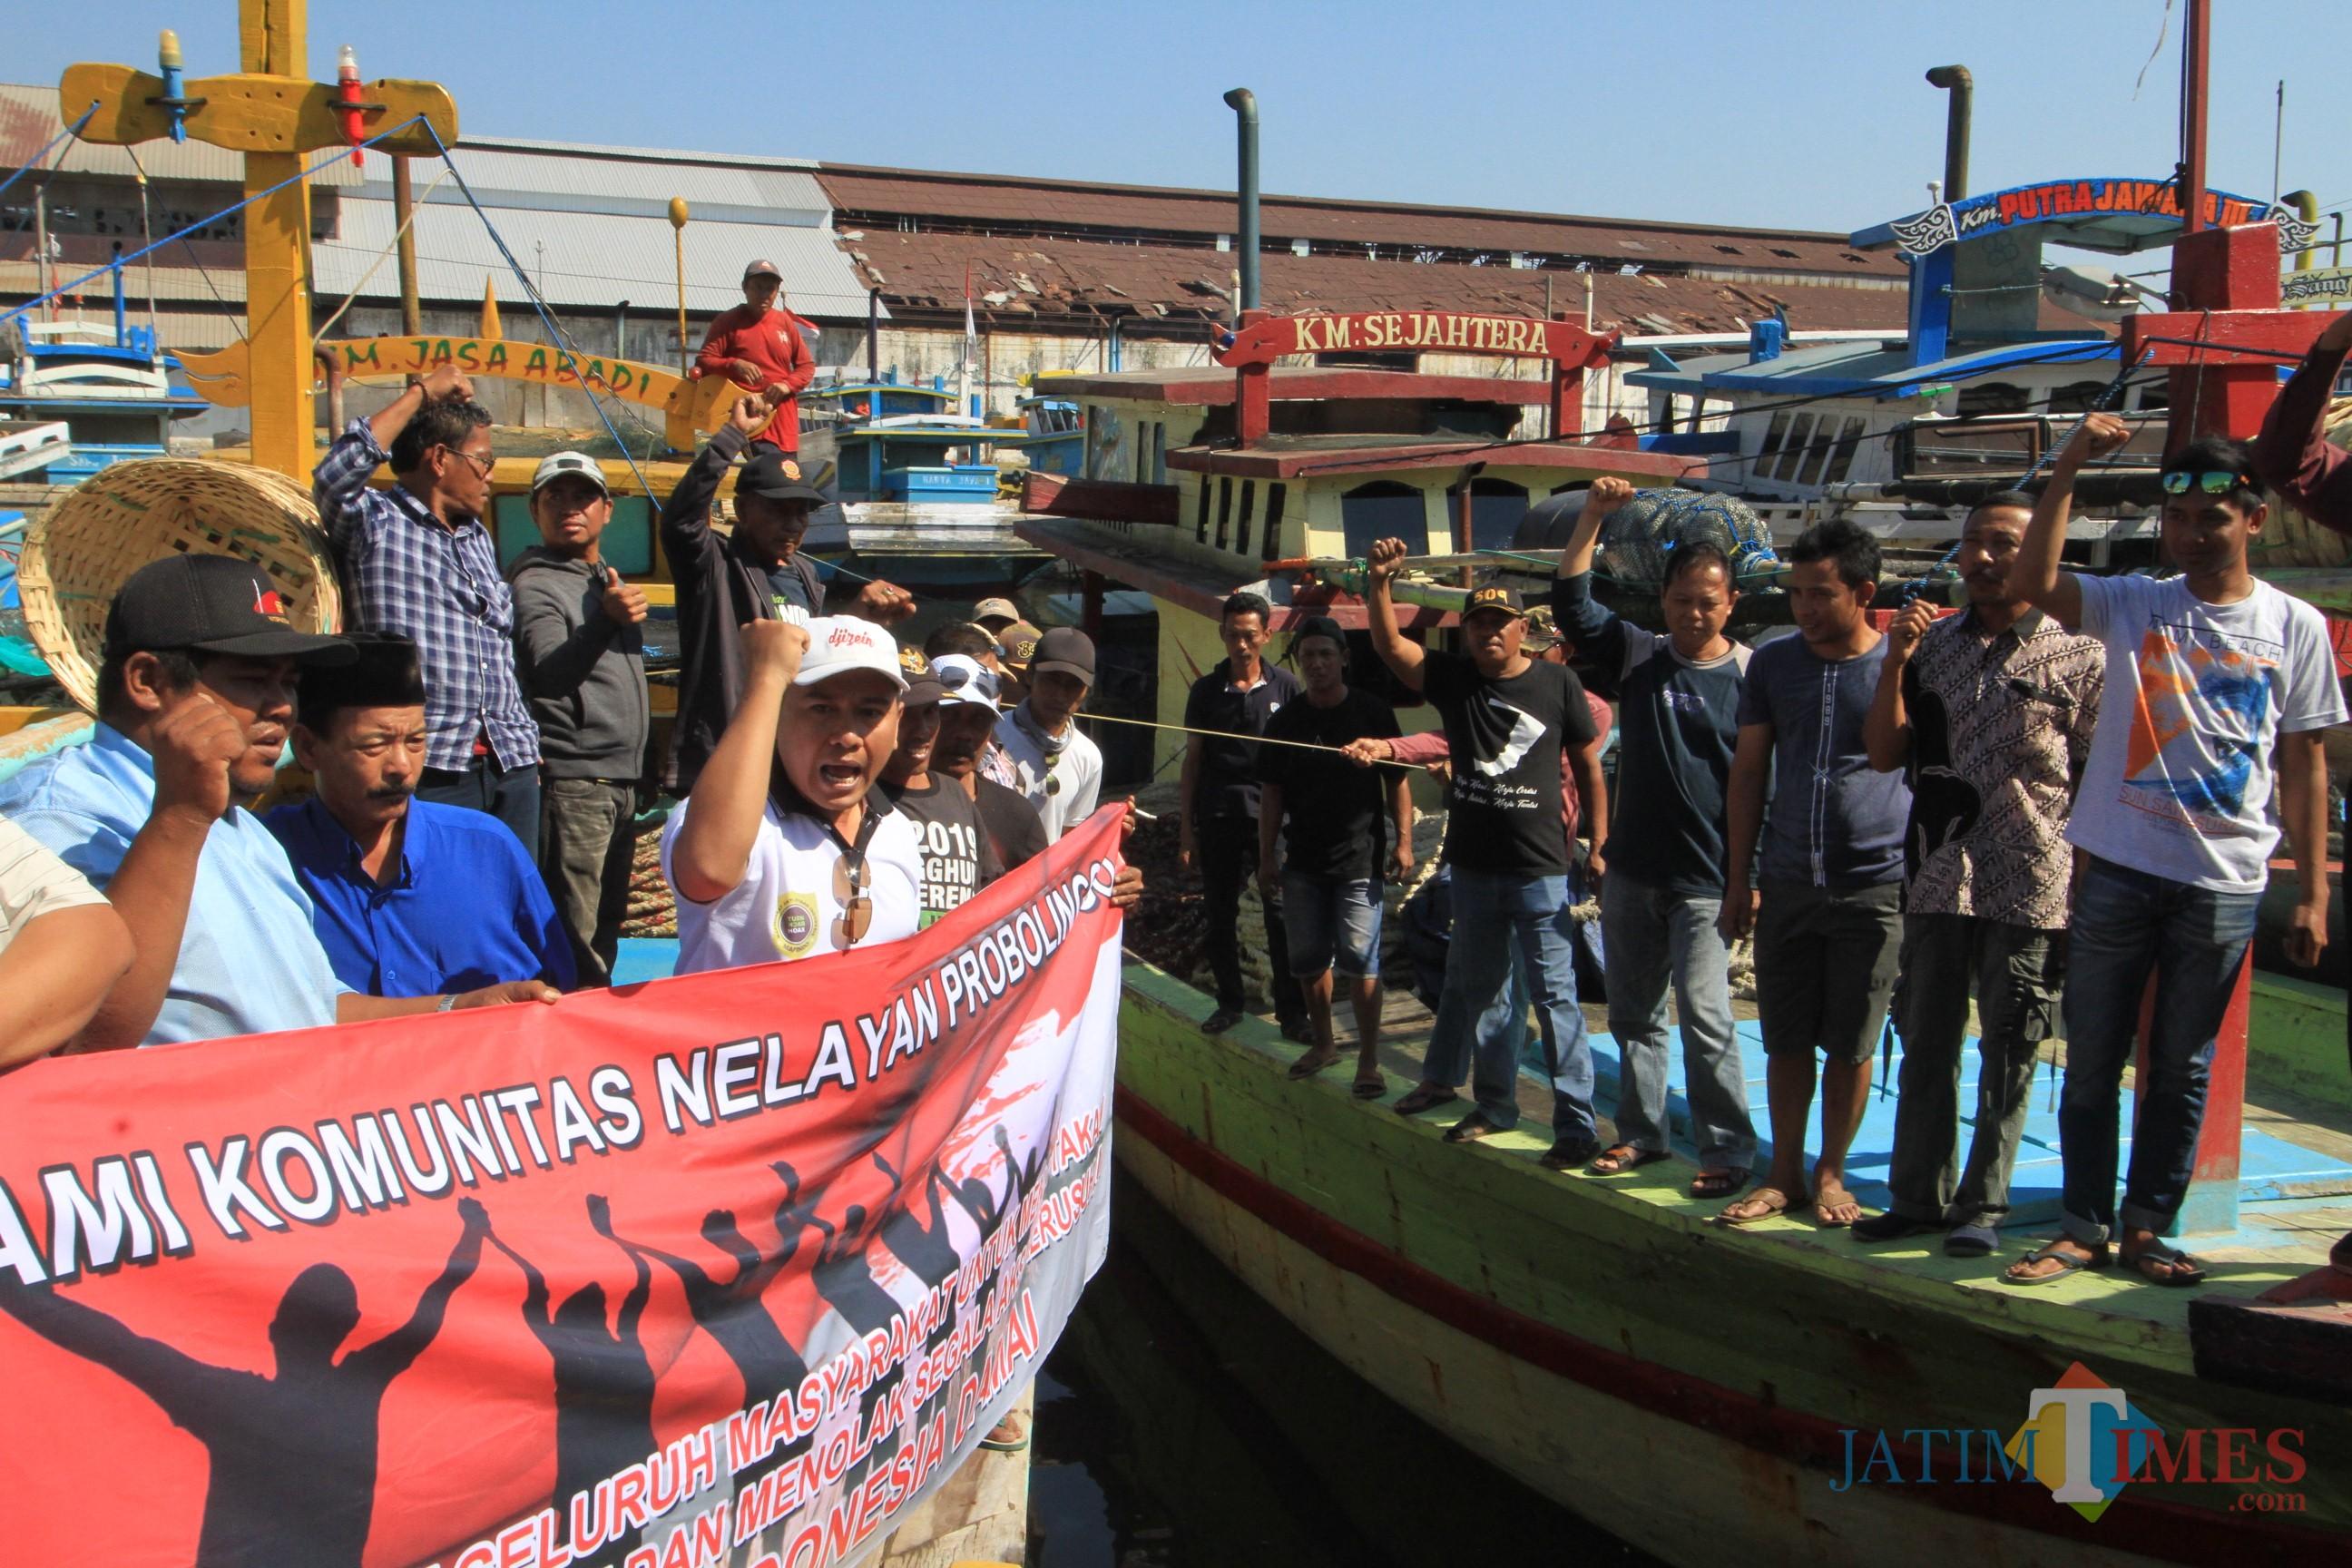 Nelayan Kota Probolinggo deklarasi tolak ajakan berdemo diatas kapal (Agus Salam/Jatim TIMES)